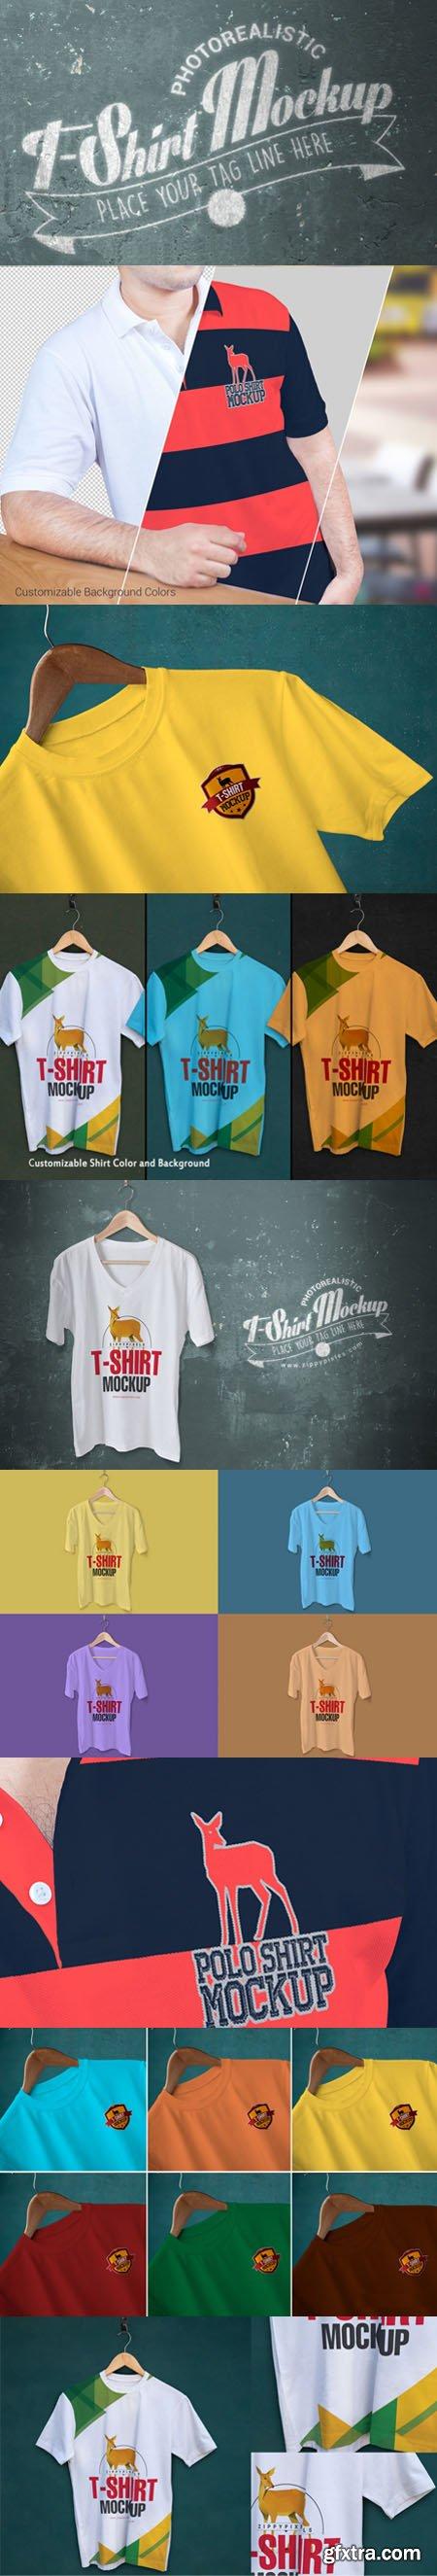 Trendy & Fabulous [V-Neck/Round Neck/Polo] T-Shirt Mockups